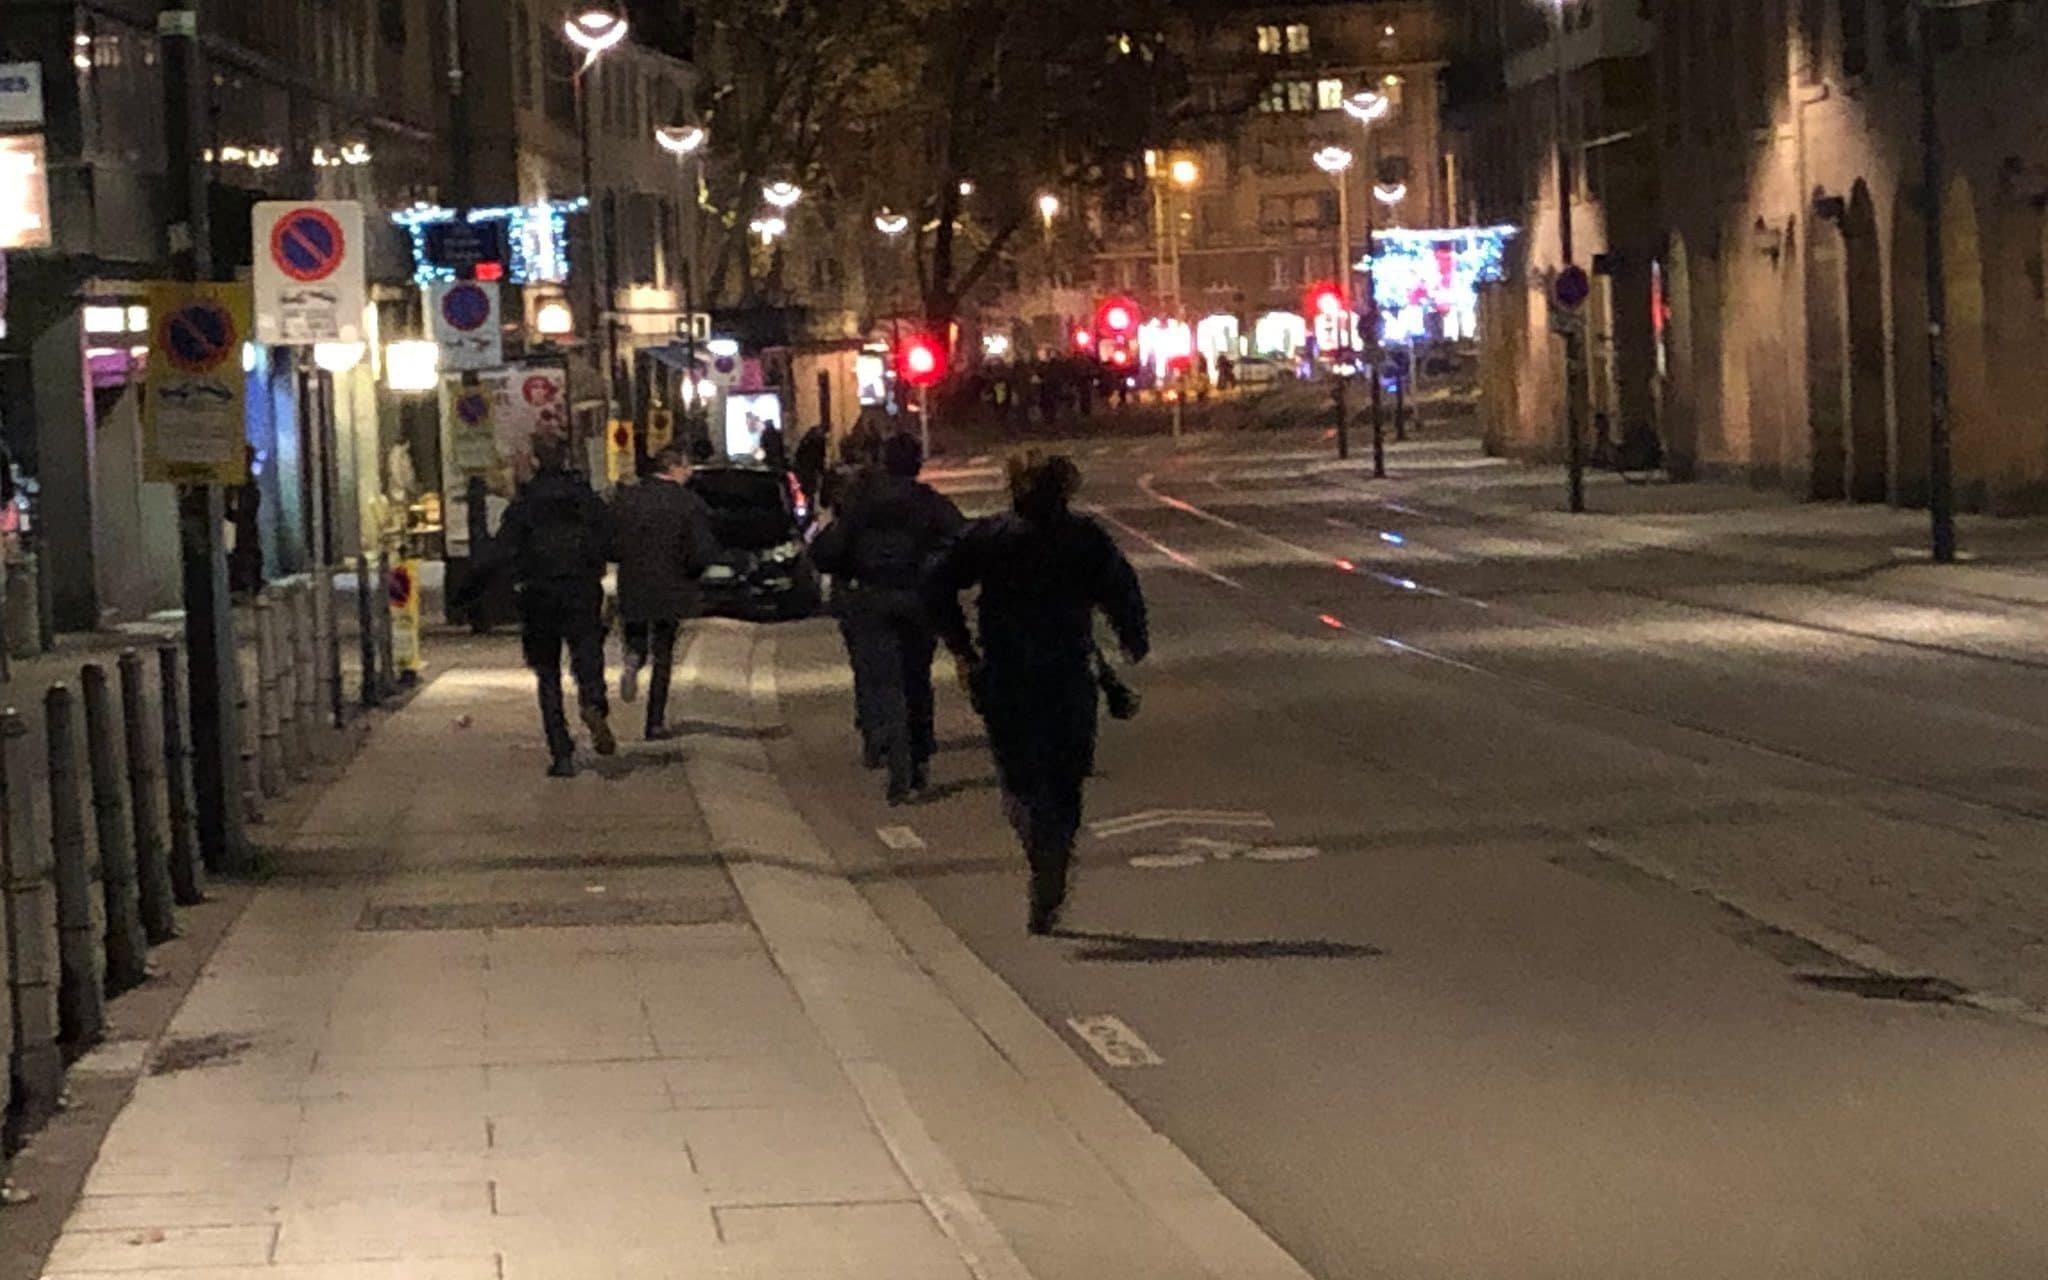 Tρομοκρατική επίθεση στο Στρασβούργο: Τουλάχιστον τέσσερις οι νεκροί - Γεννημένος στην πόλη ο